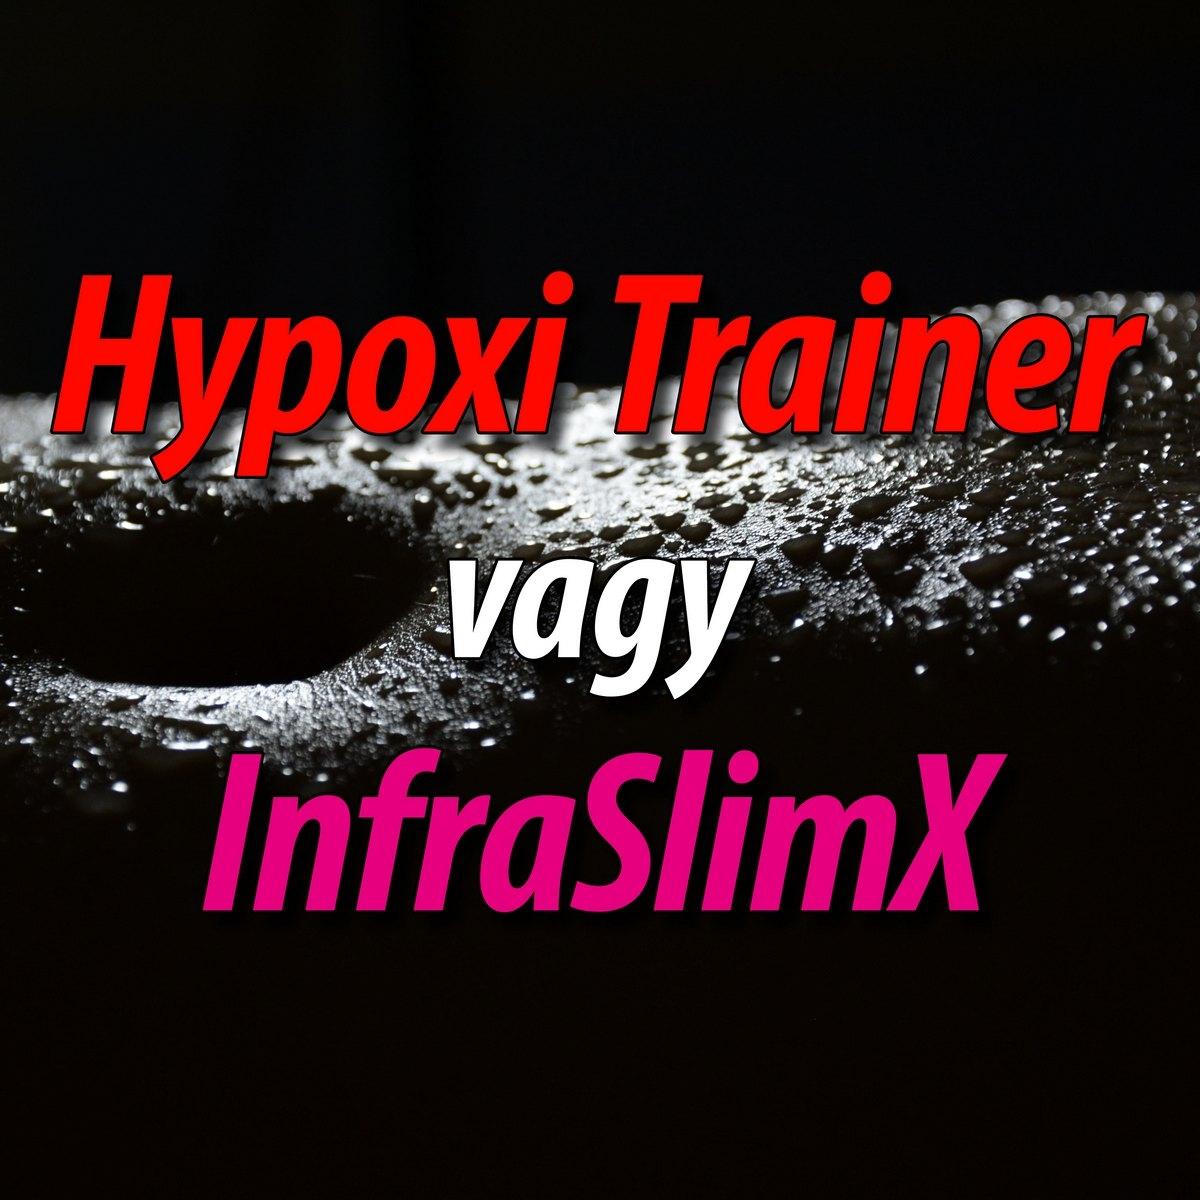 hypoxi trainer budapest